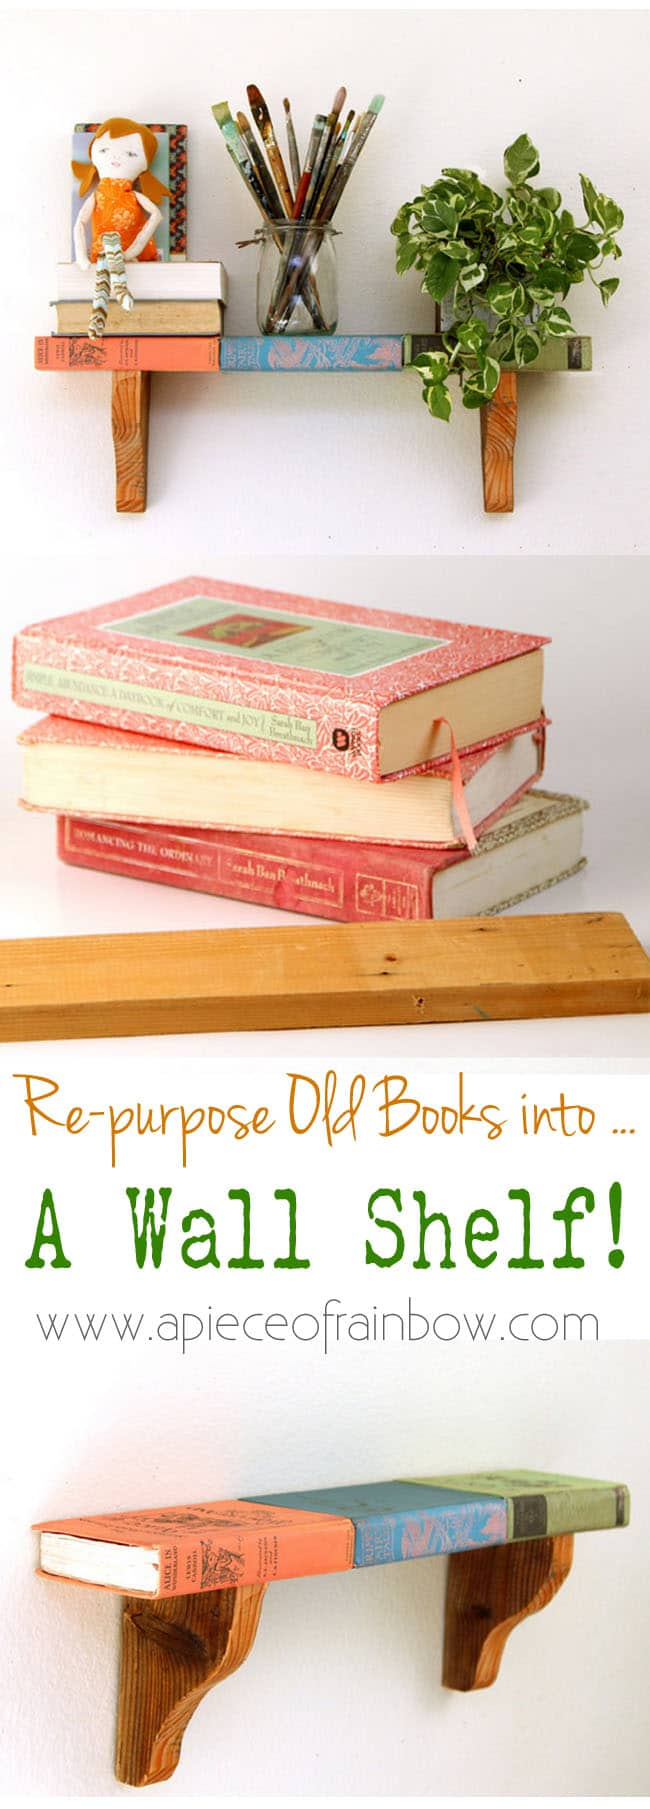 upcycled-books-wall-shelf-apieceofrainbow (1)